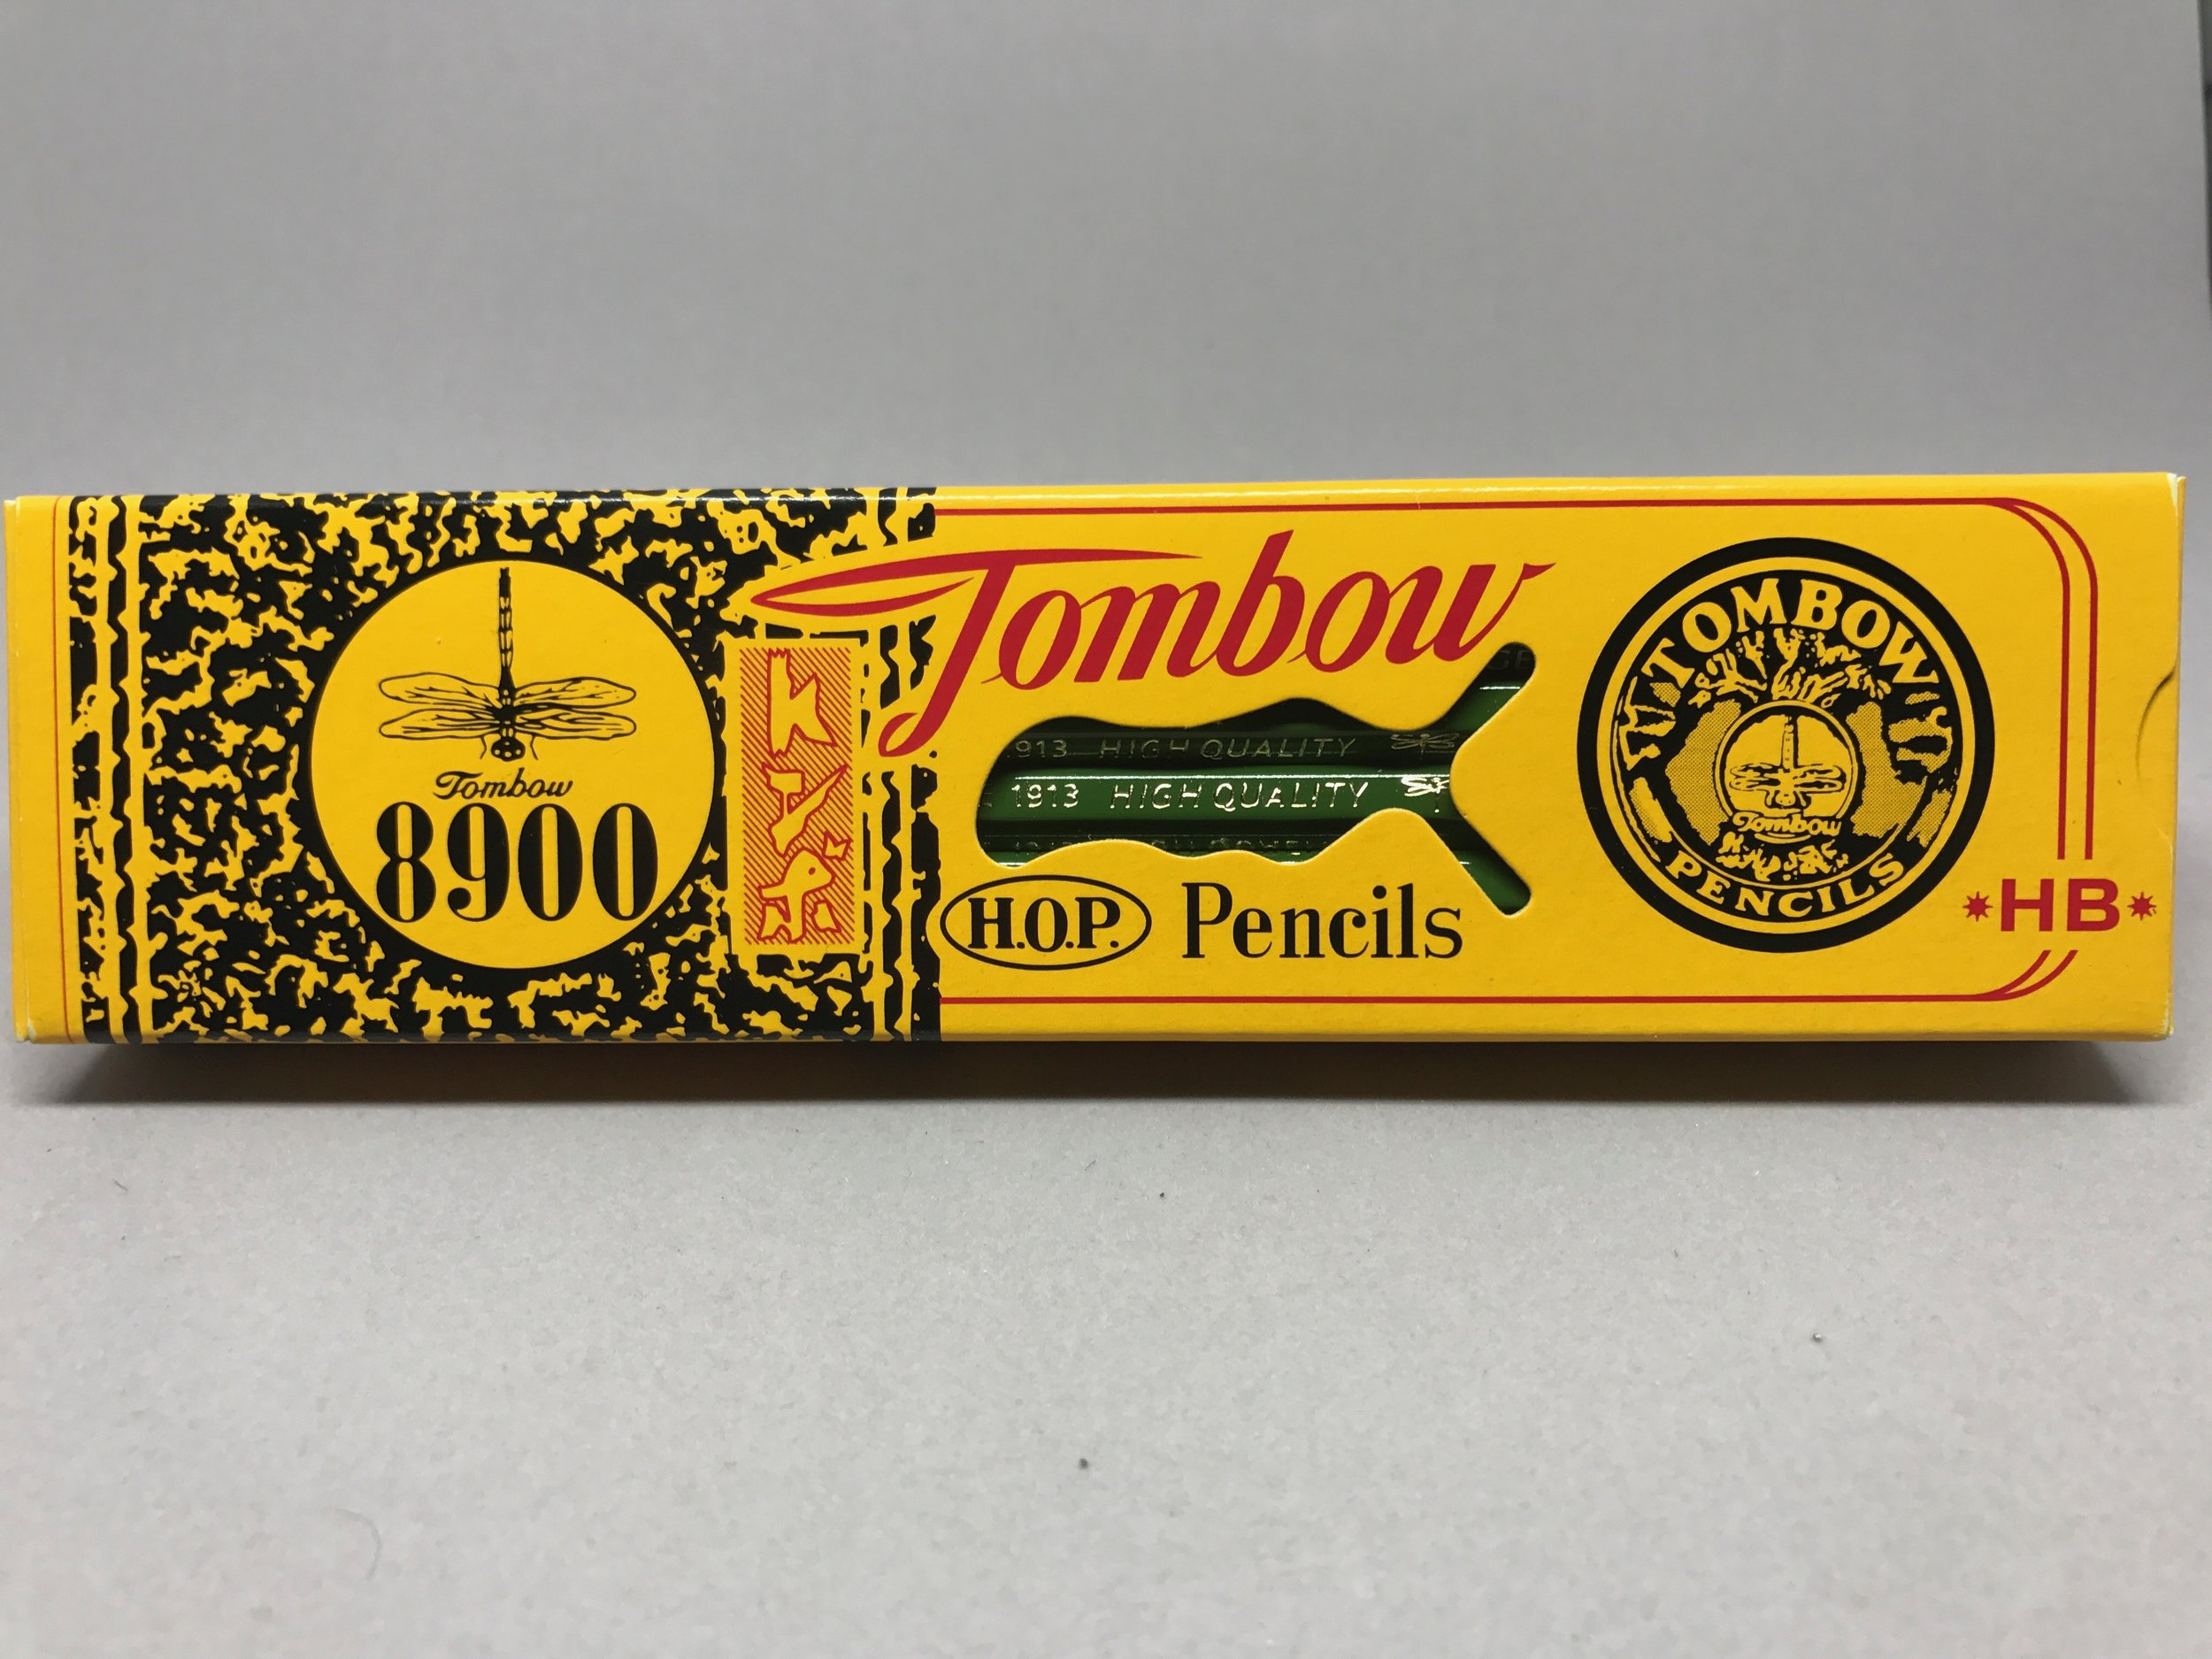 tombow-8900-pencil-1.jpg